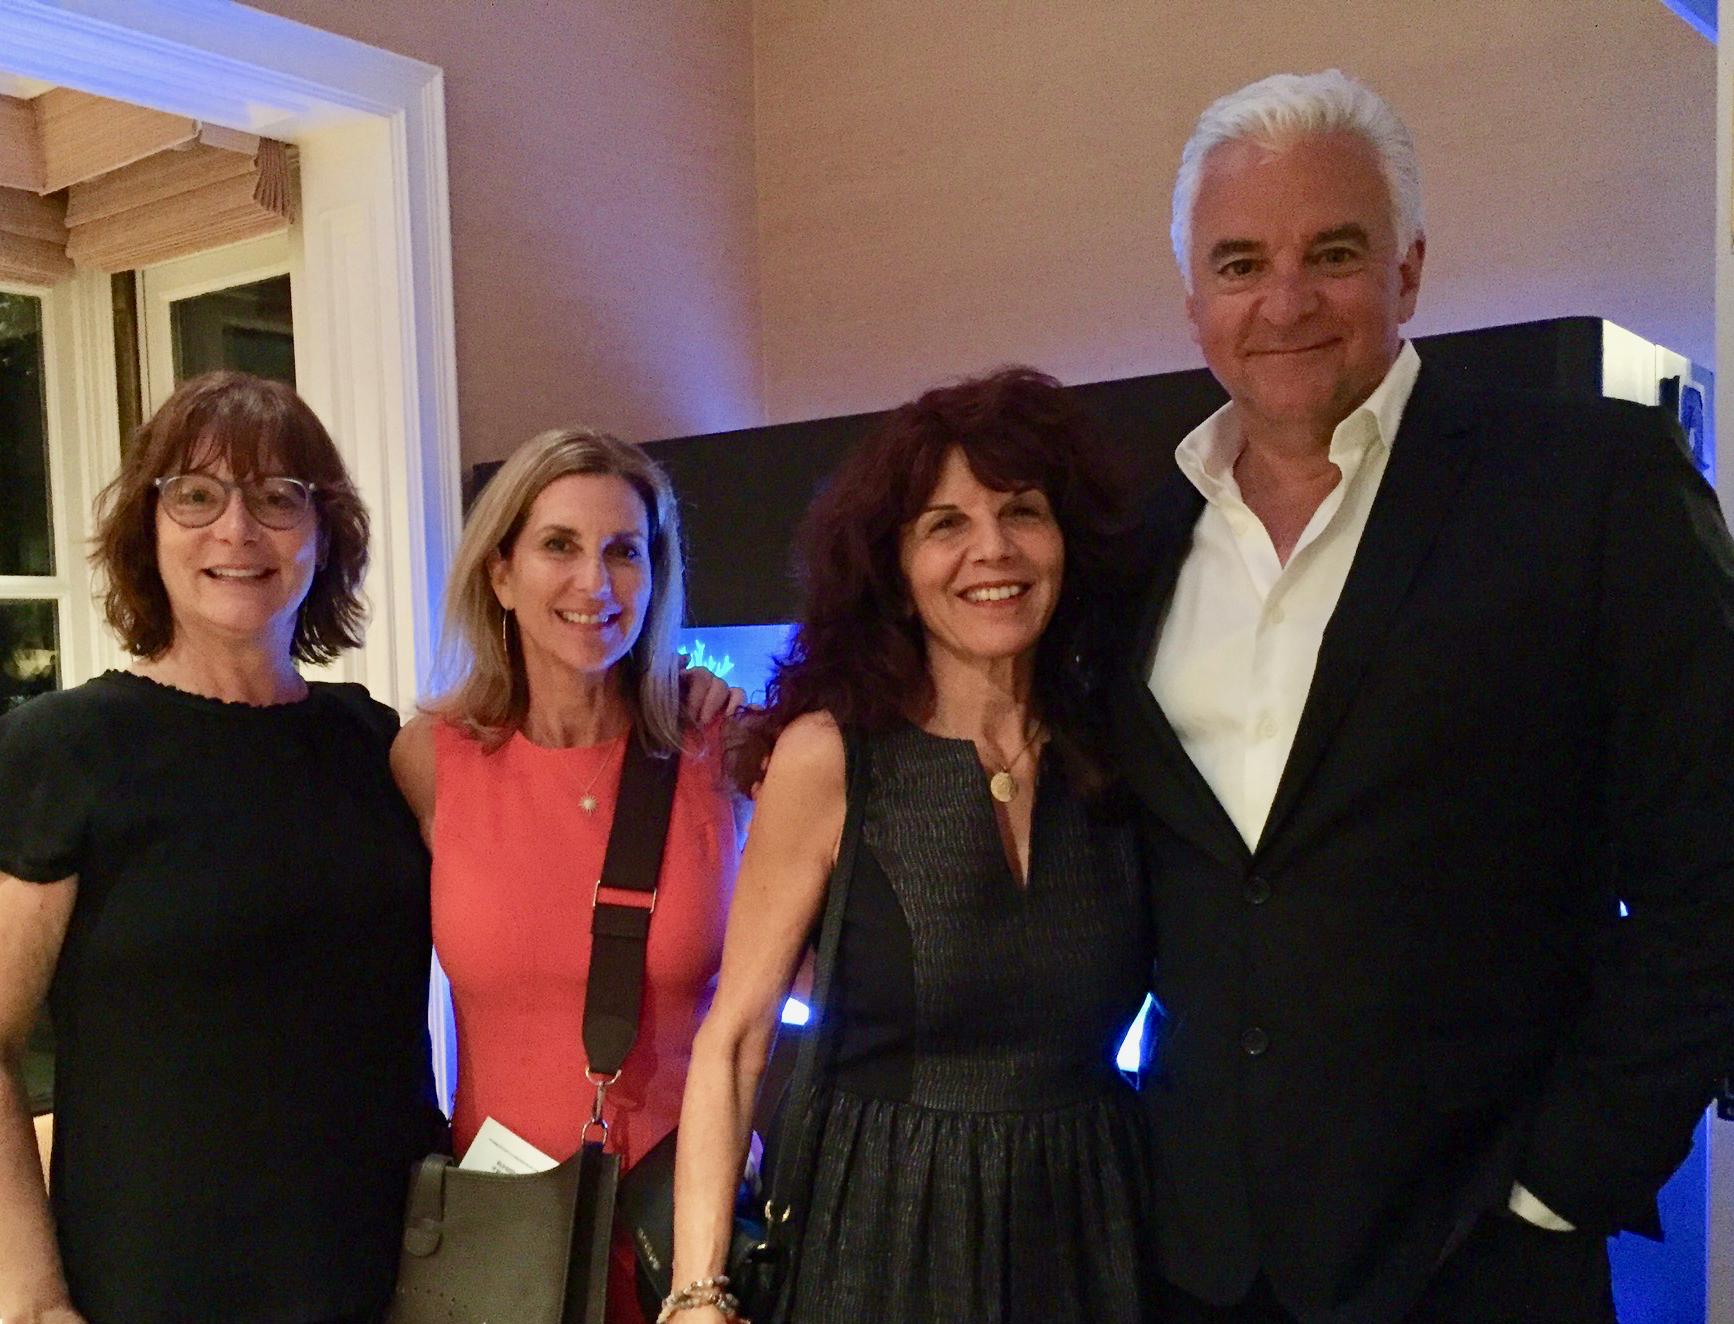 Lisa Greer, AnnDee Levy, Diana Buckhantz & John O'Hurley